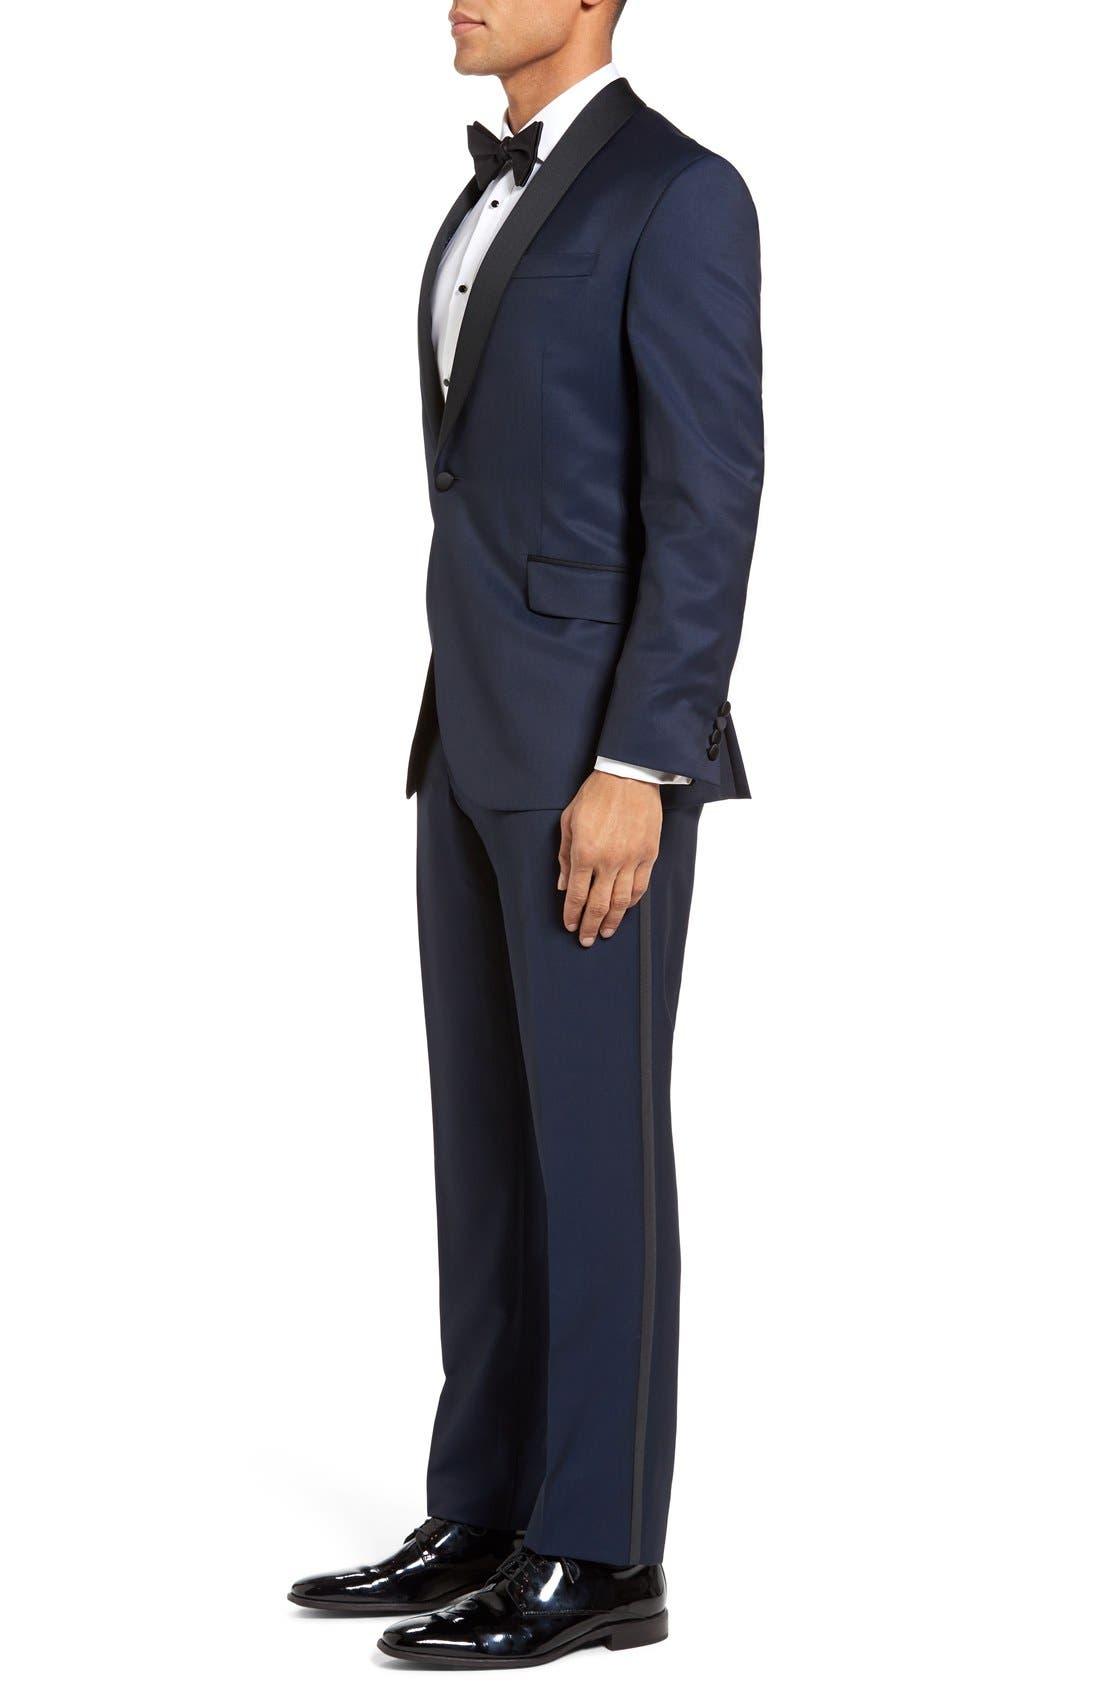 Alternate Image 3  - Ted Baker London 'Josh' Trim Fit Navy Shawl Lapel Tuxedo